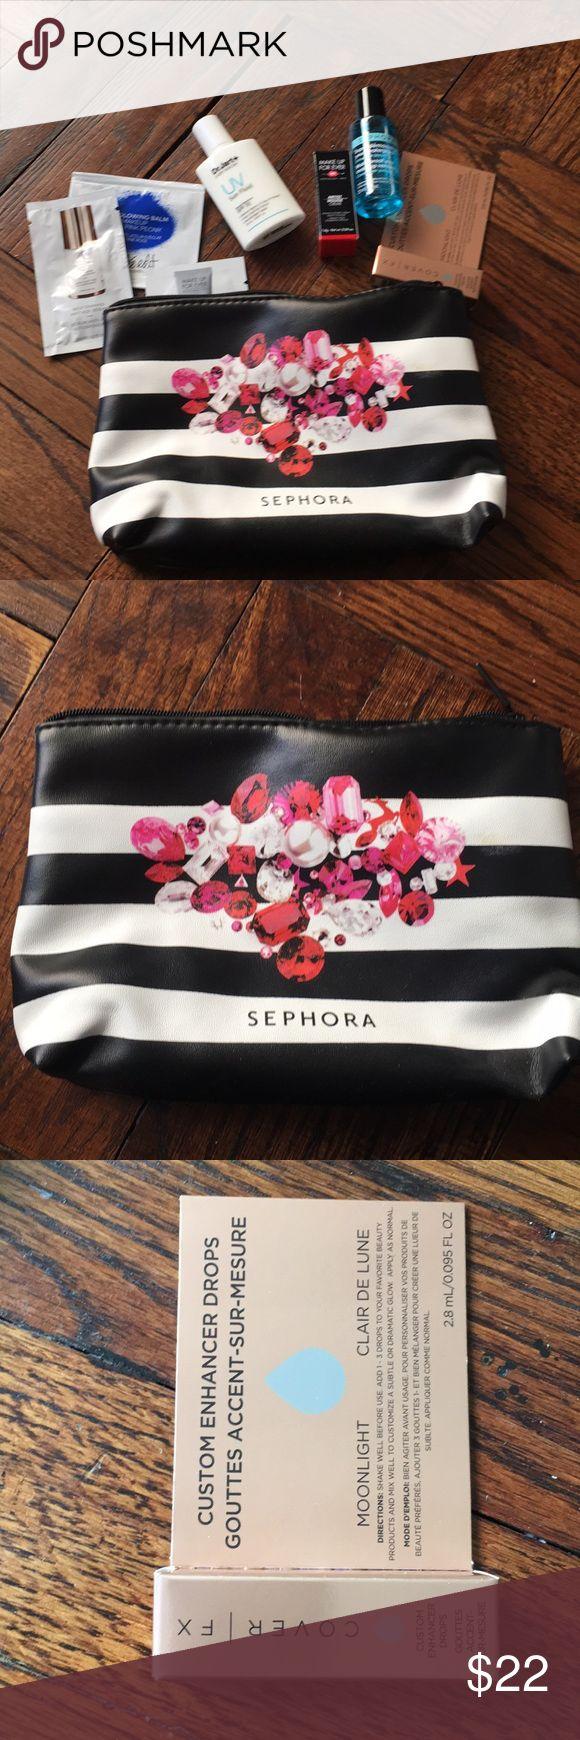 Sephora goodie bag!!! Makes a great gift! NWT Sephora